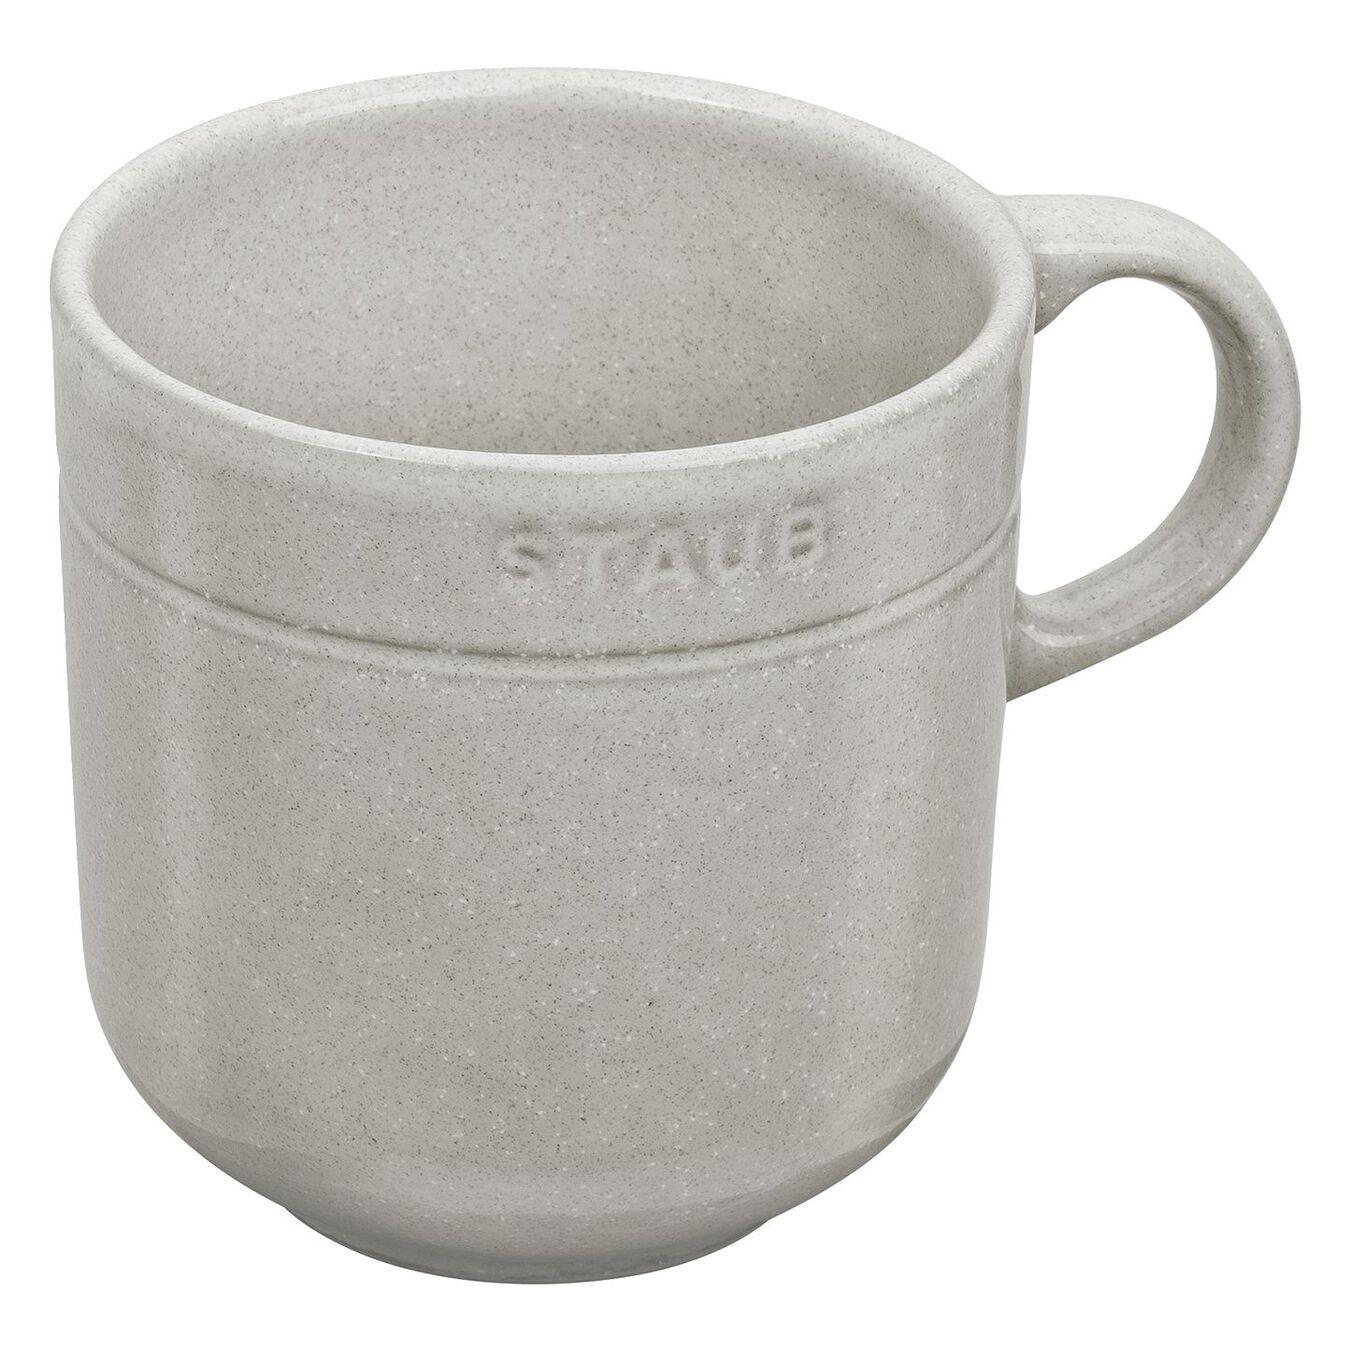 Dessert cup set, 4 Piece | White Truffle | Ceramic | round | Ceramic,,large 1